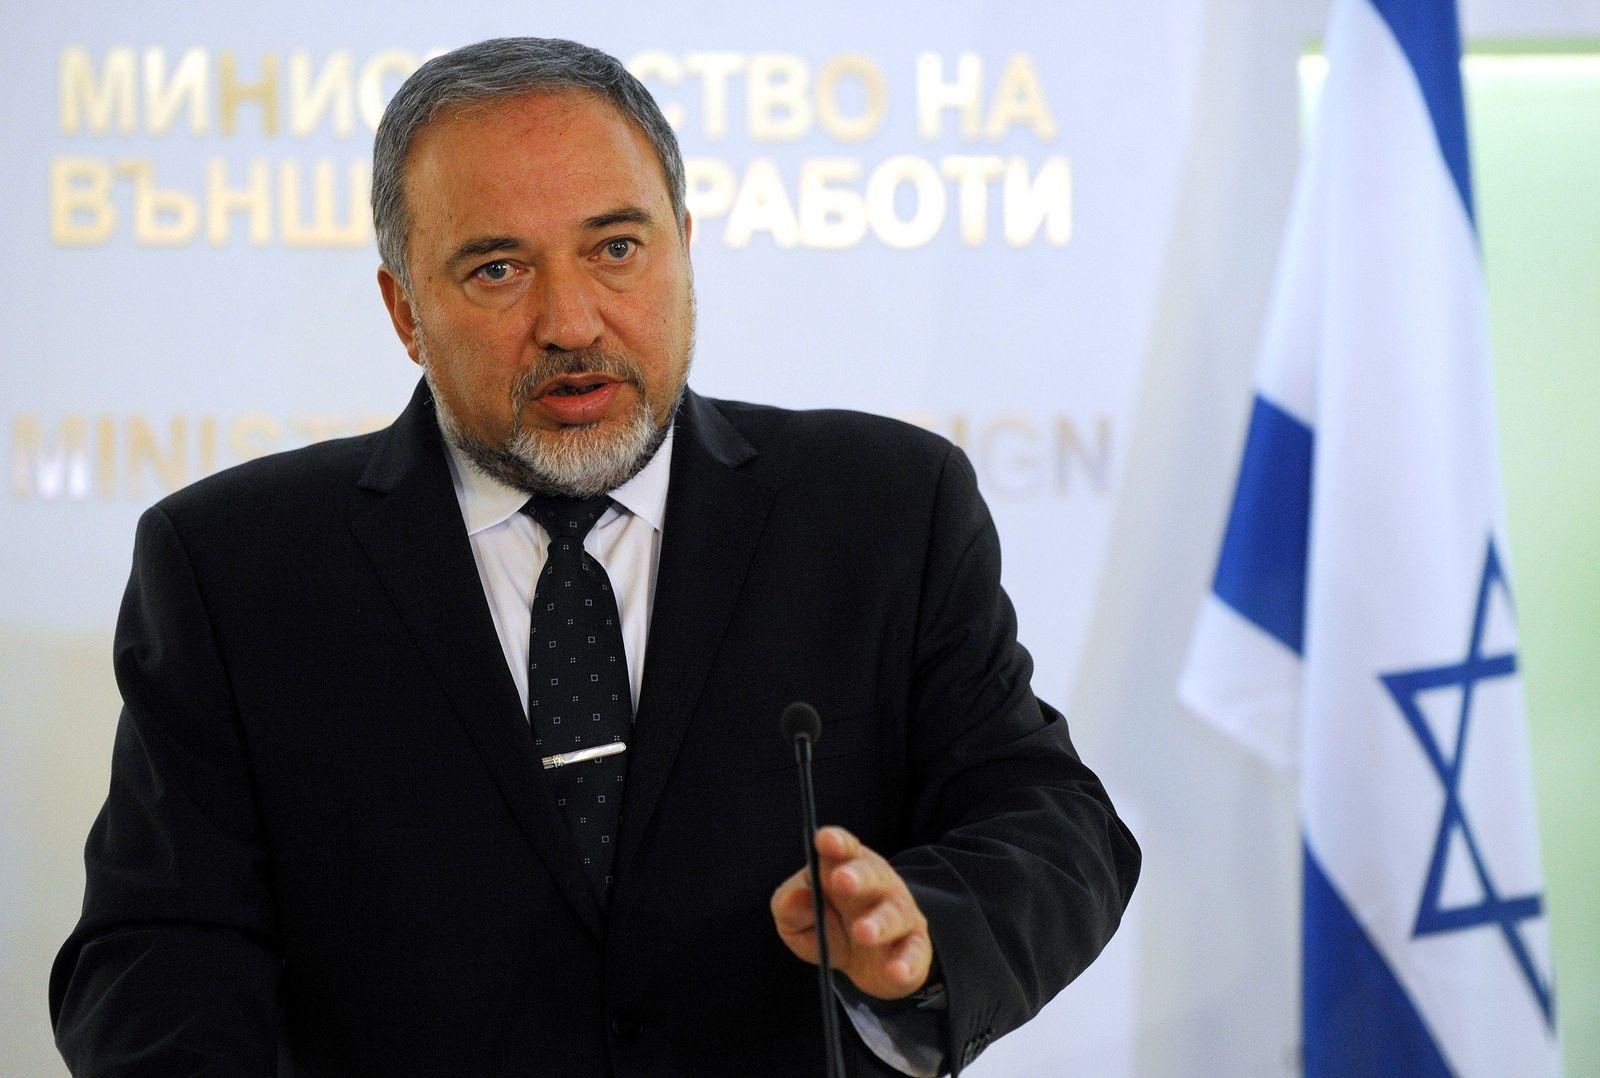 Avigdor Lieberman/Israel